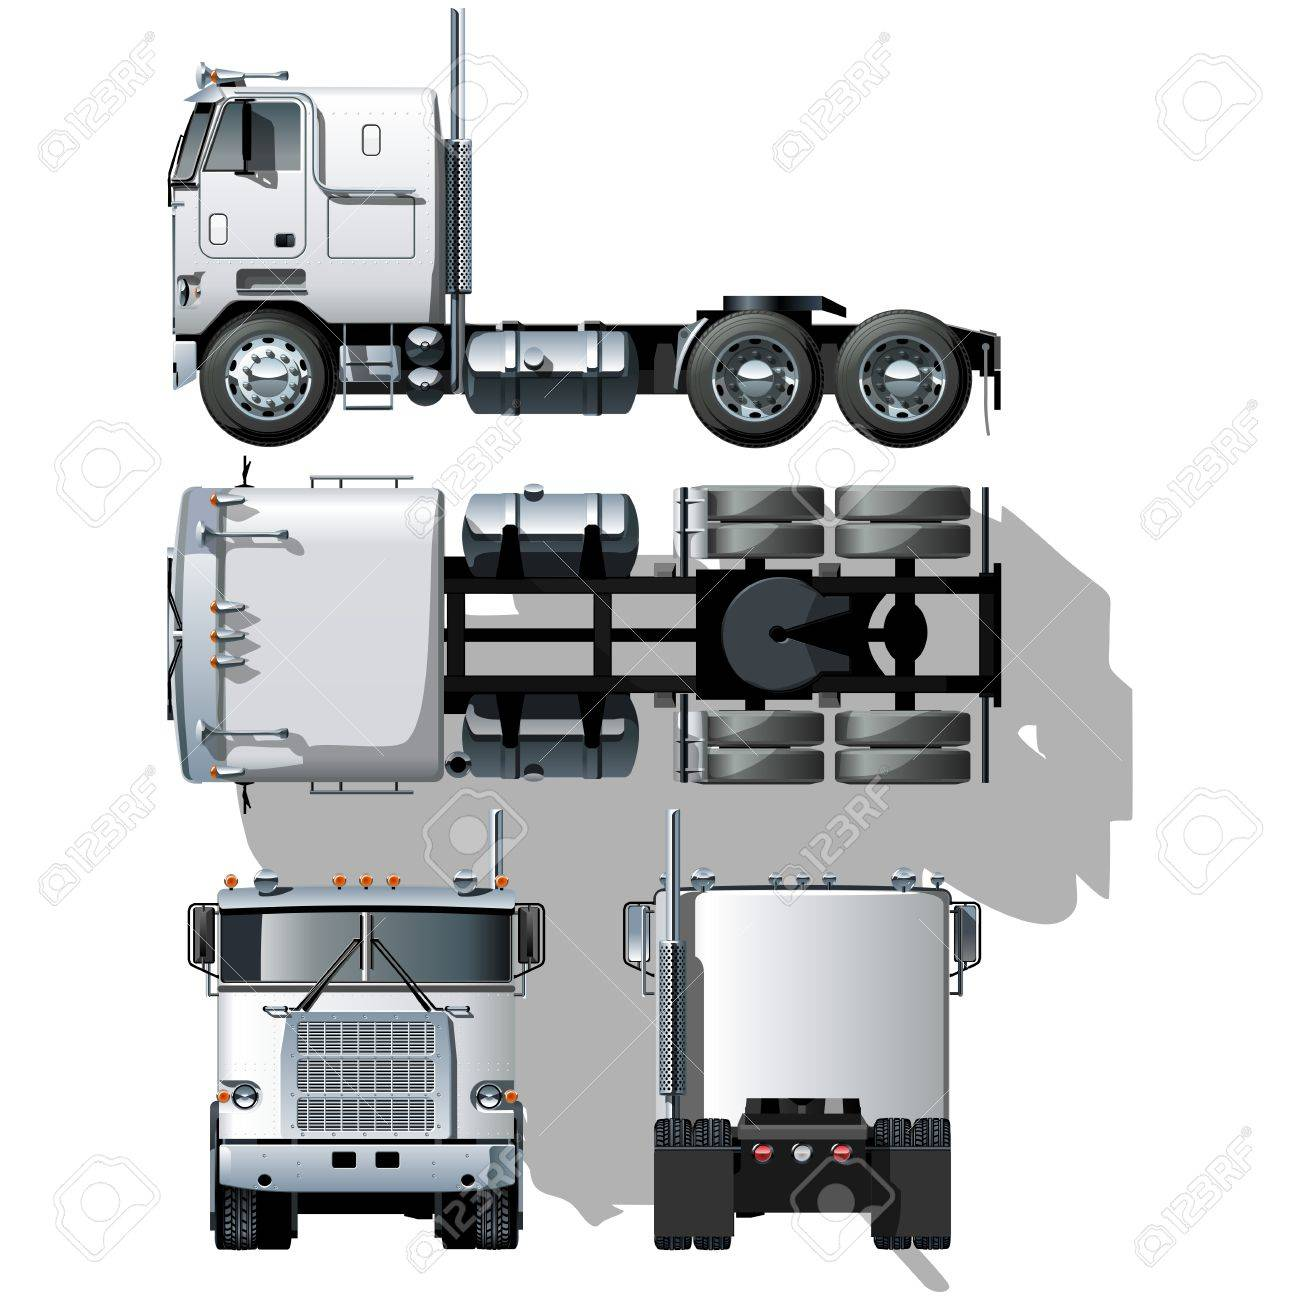 hi-detailed semi-truck - 8859177